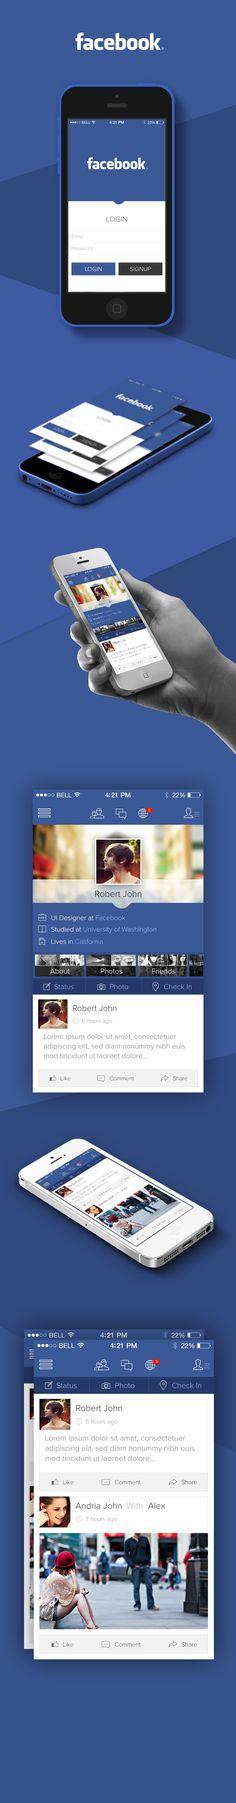 Facebook iOS7 Redesi